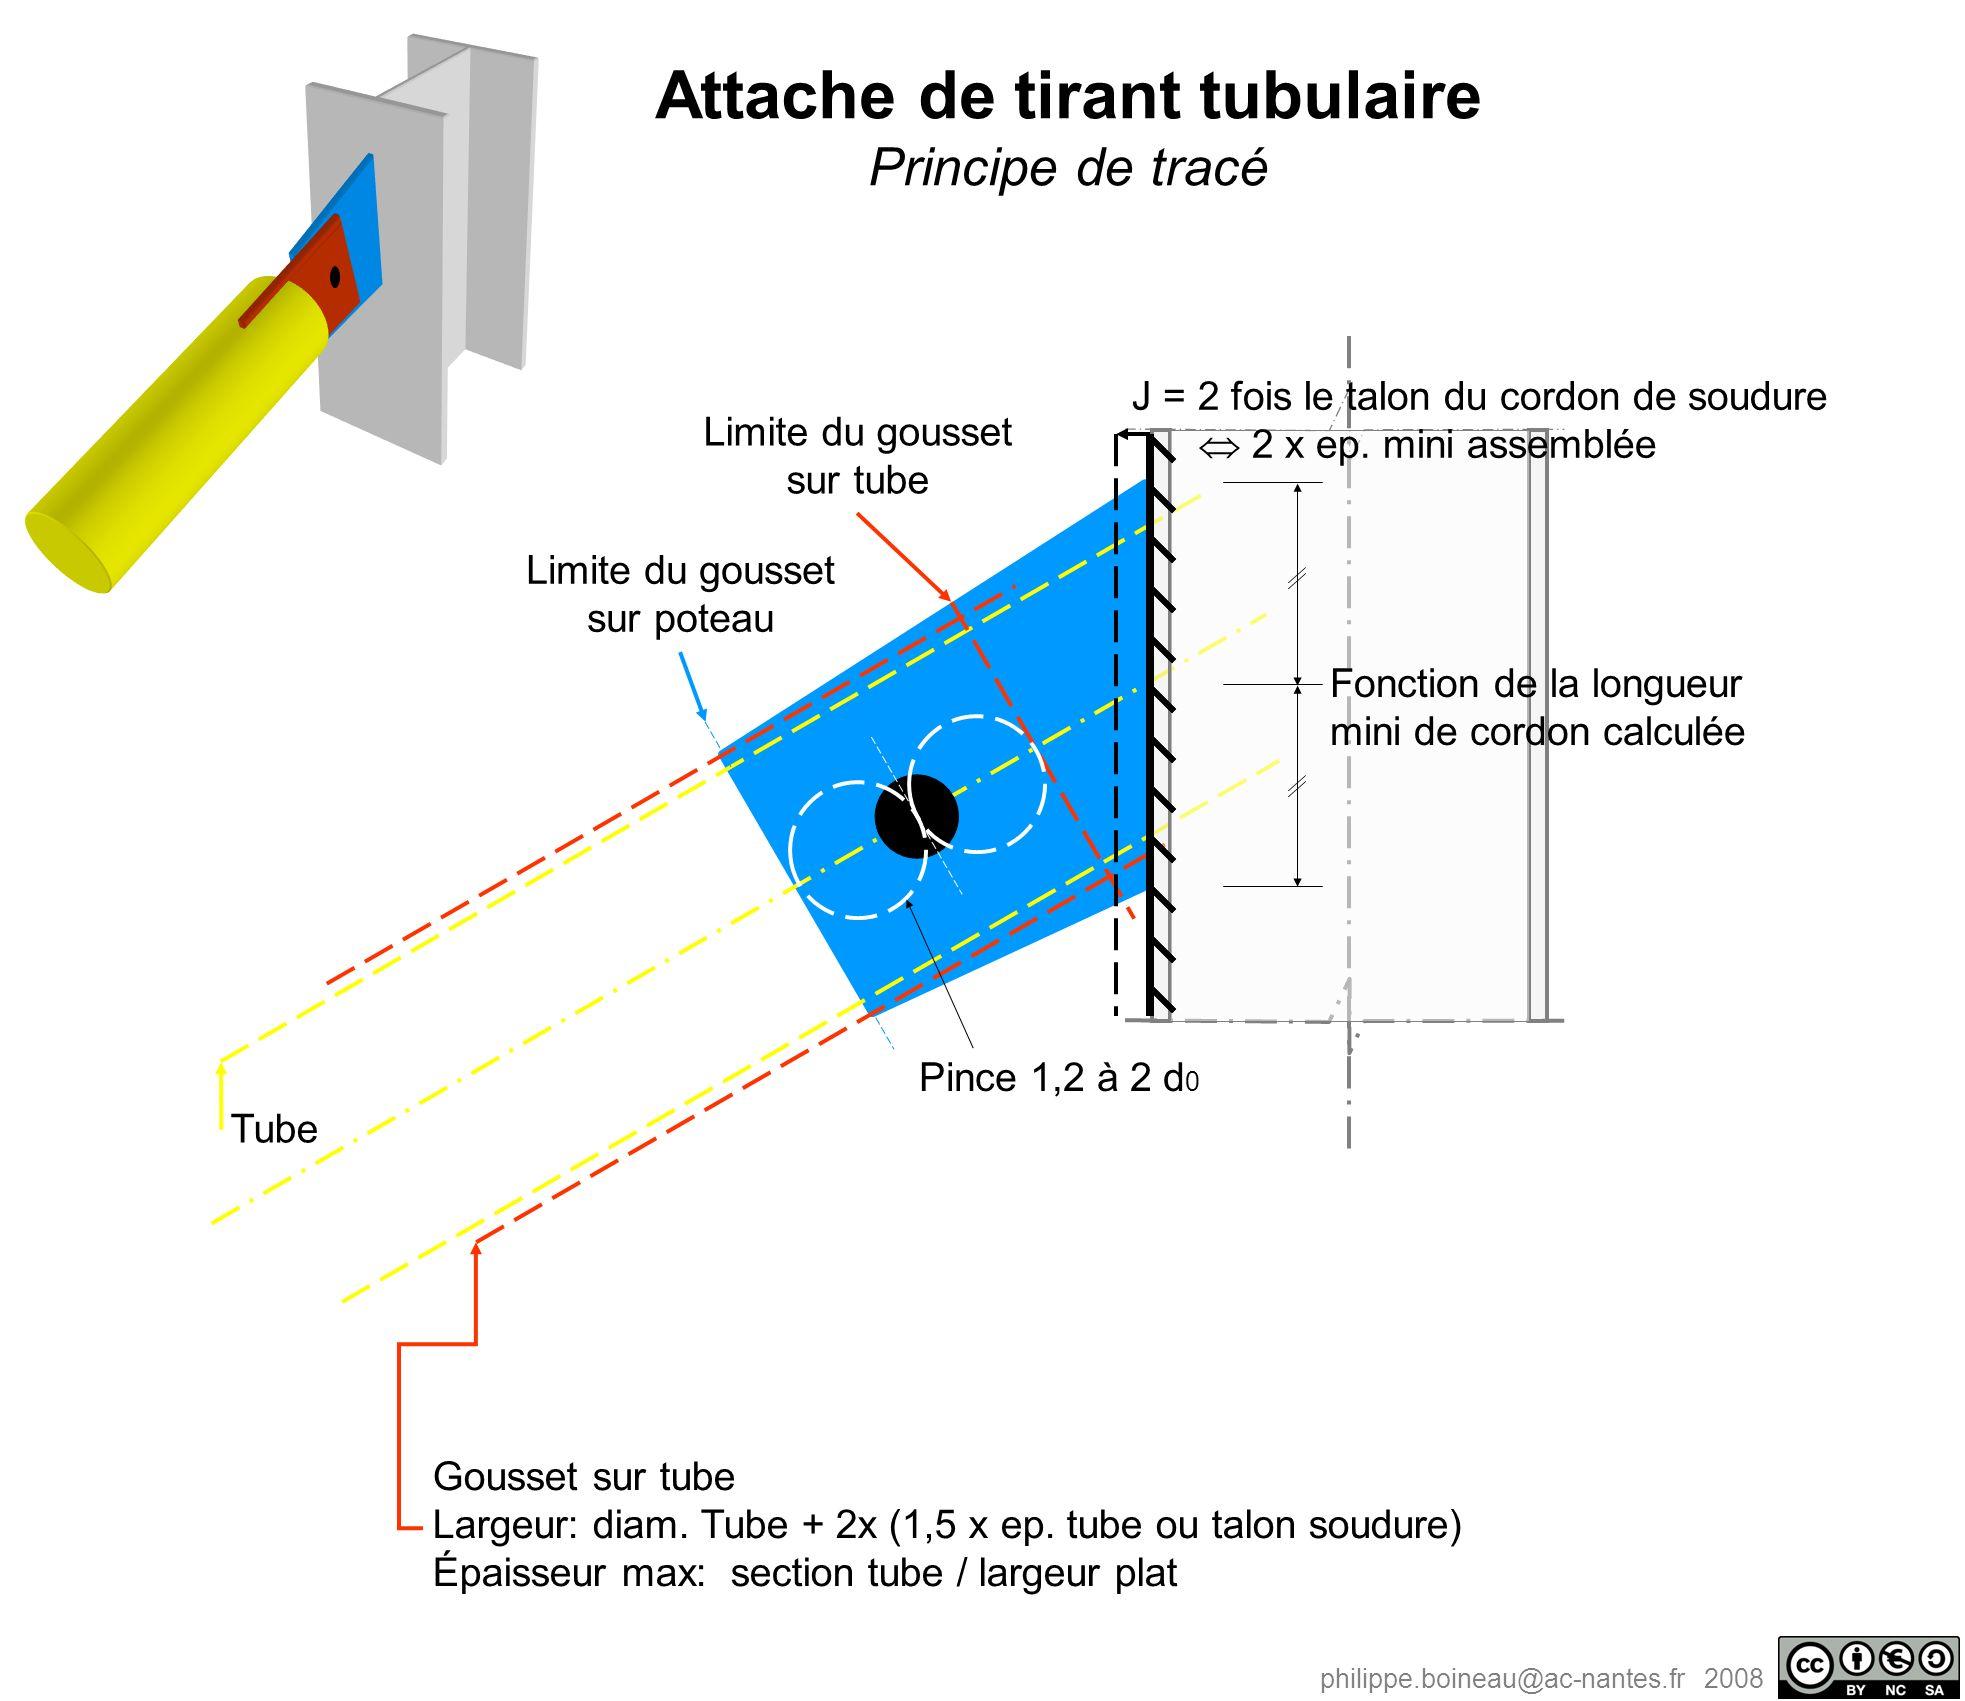 philippe.boineau@ac-nantes.fr 2008 Tube Limite du gousset sur tube Limite du gousset sur poteau Gousset sur tube Largeur: diam. Tube + 2x (1,5 x ep. t